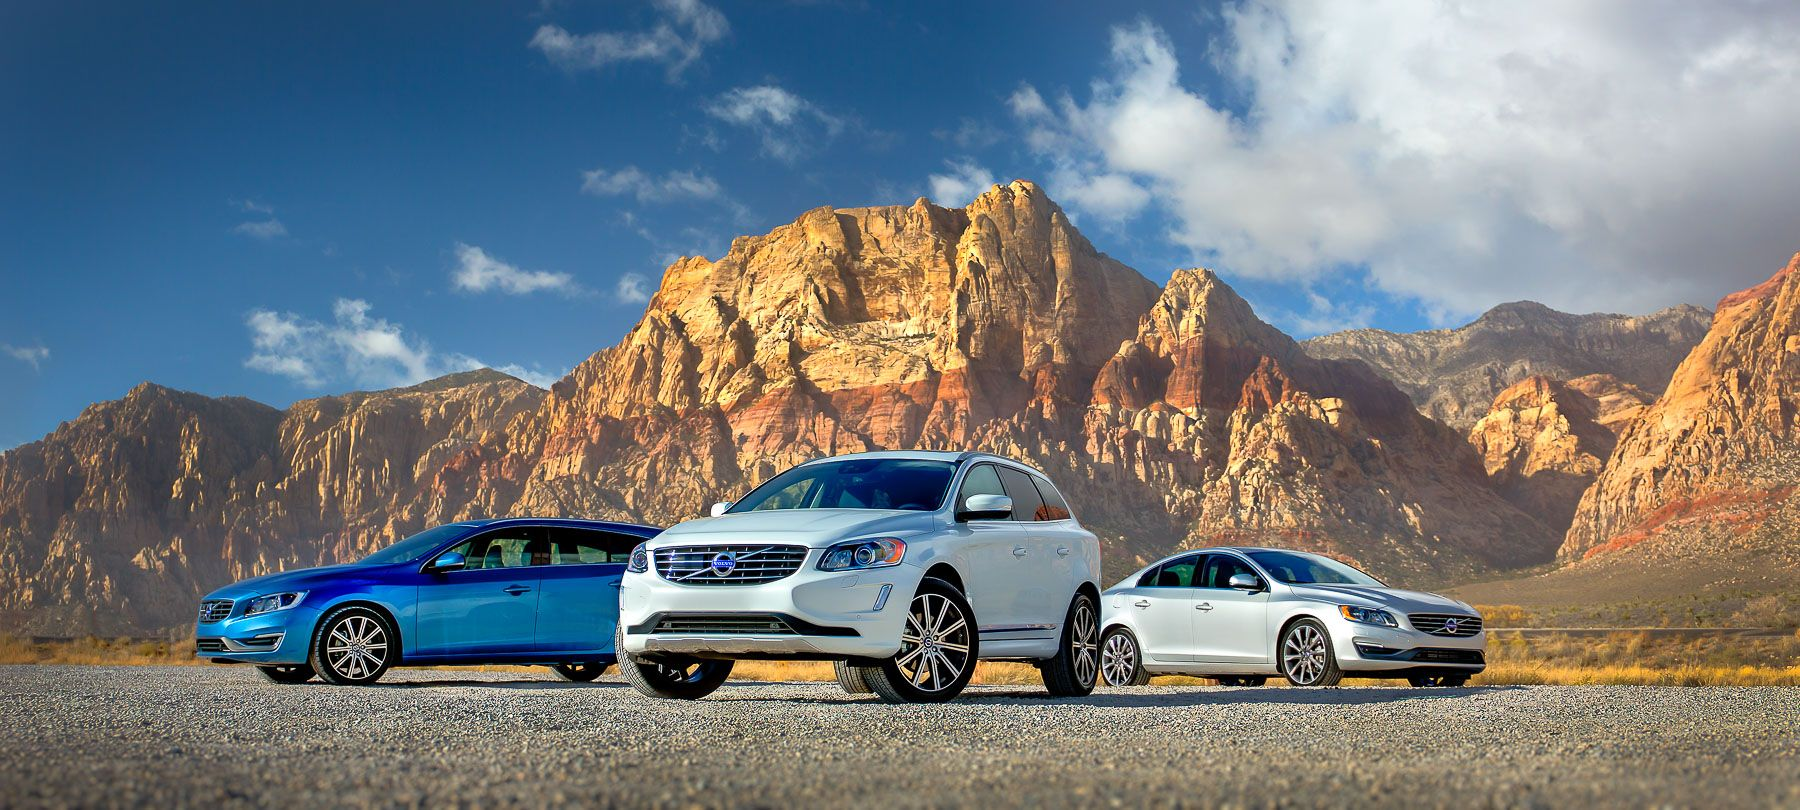 Volvos, outside Las Vegas